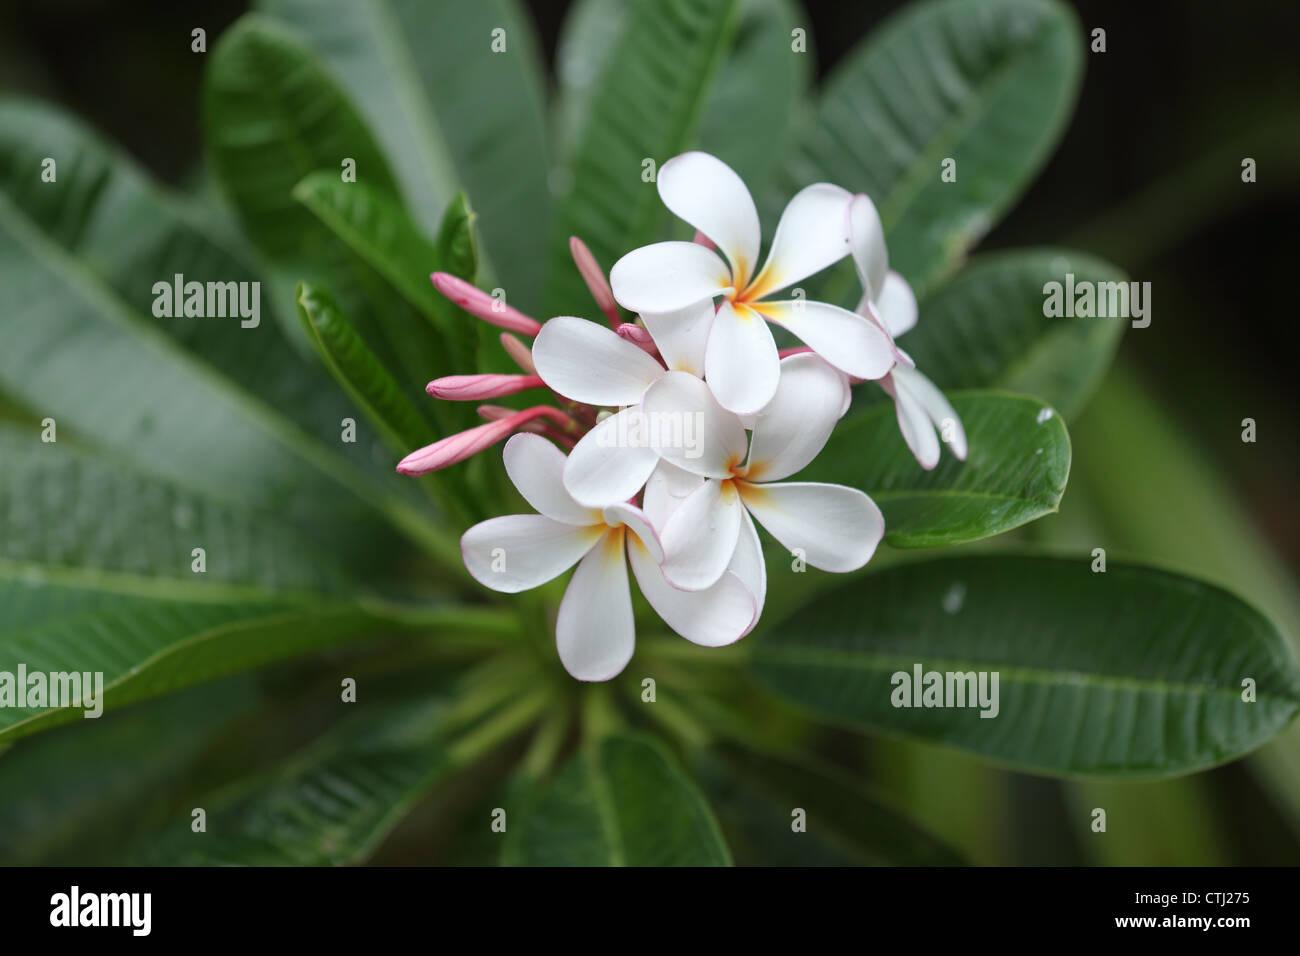 Plumeria flowers stock photos plumeria flowers stock images alamy white plumeria flowers hawaii stock image mightylinksfo